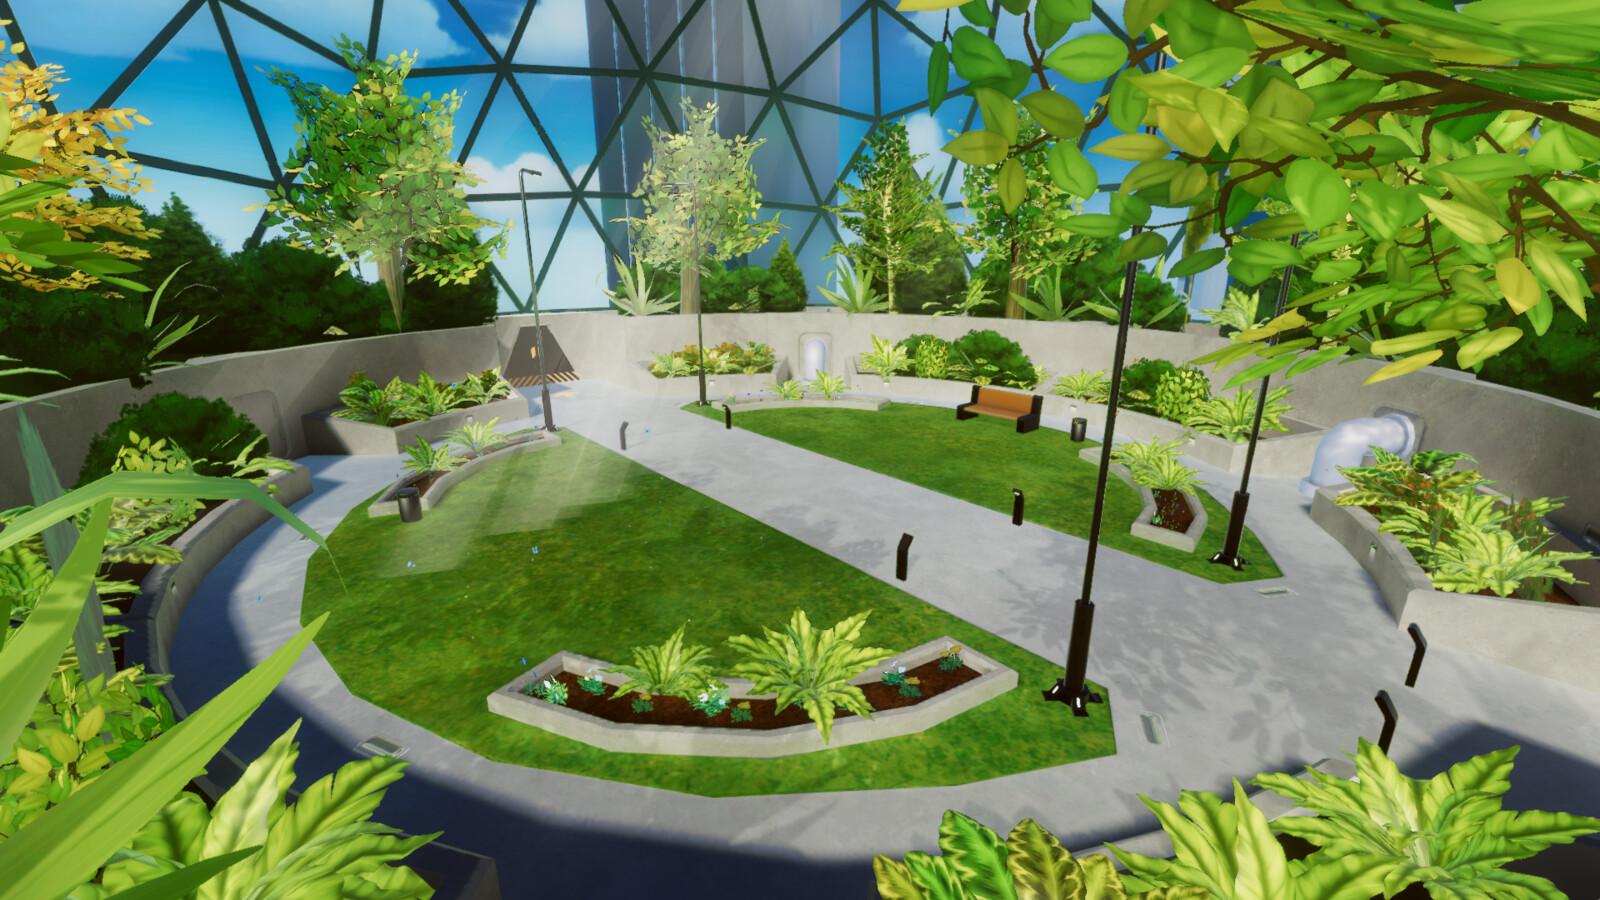 VR mobile stylized enviro dome park 2